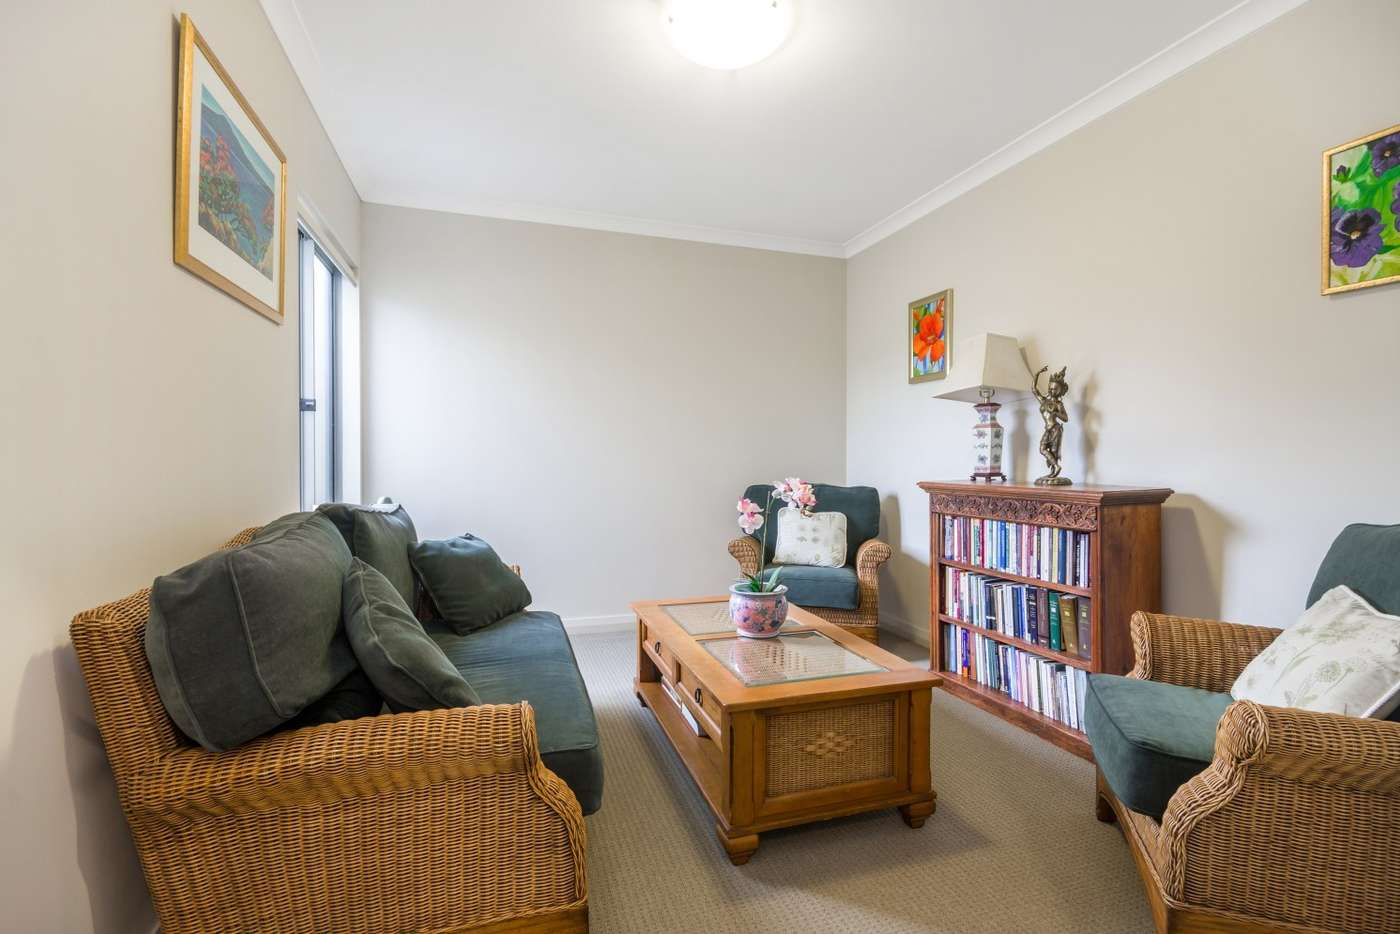 Fifth view of Homely house listing, 49C Hillsborough Drive, Nollamara WA 6061